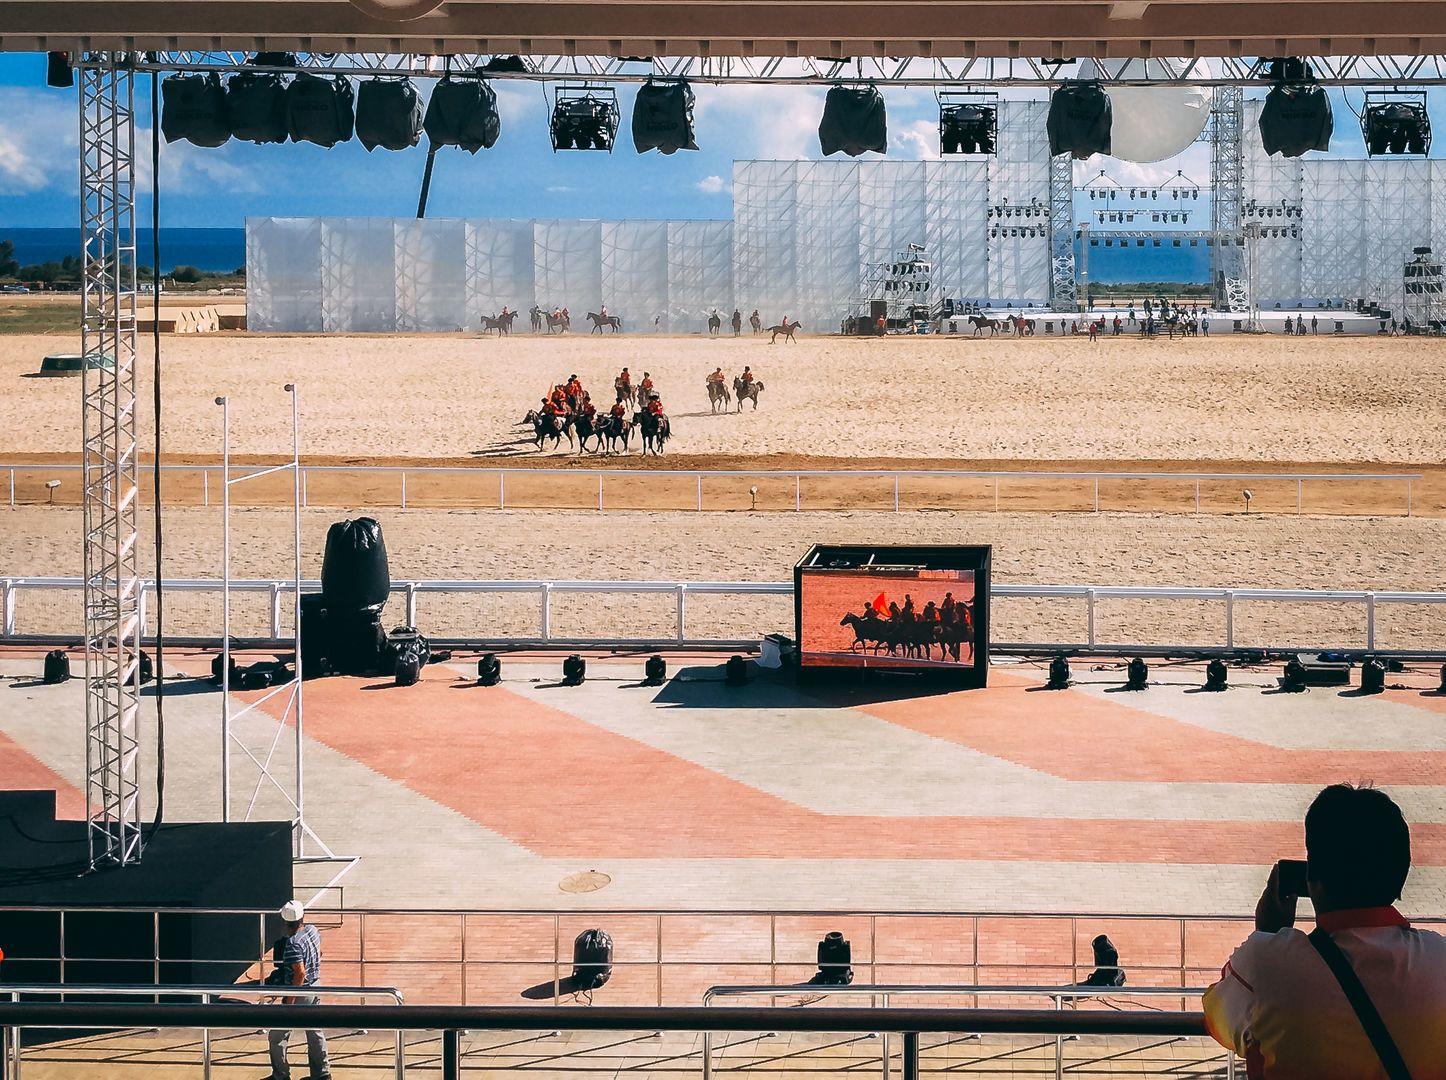 world nomad games arena, hyppodrome